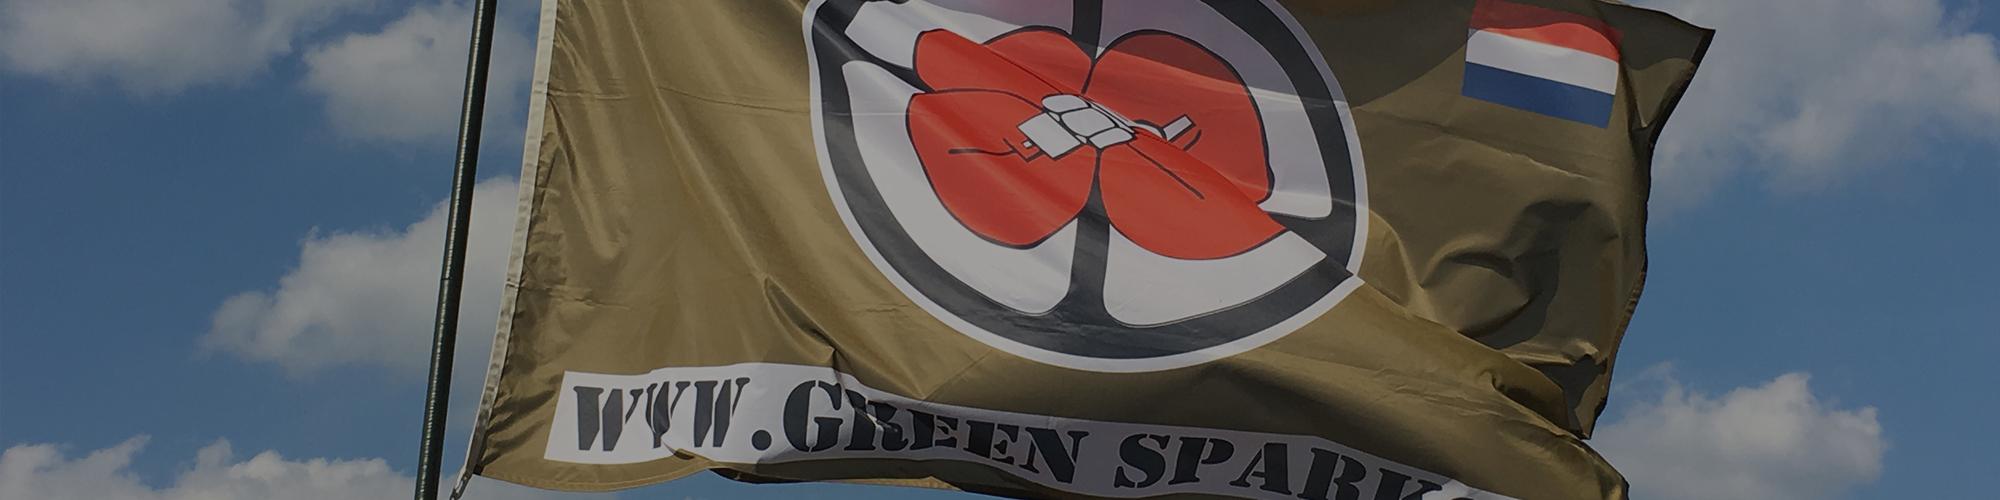 THEGREENSPARKS_HEADER_DEF3.psd